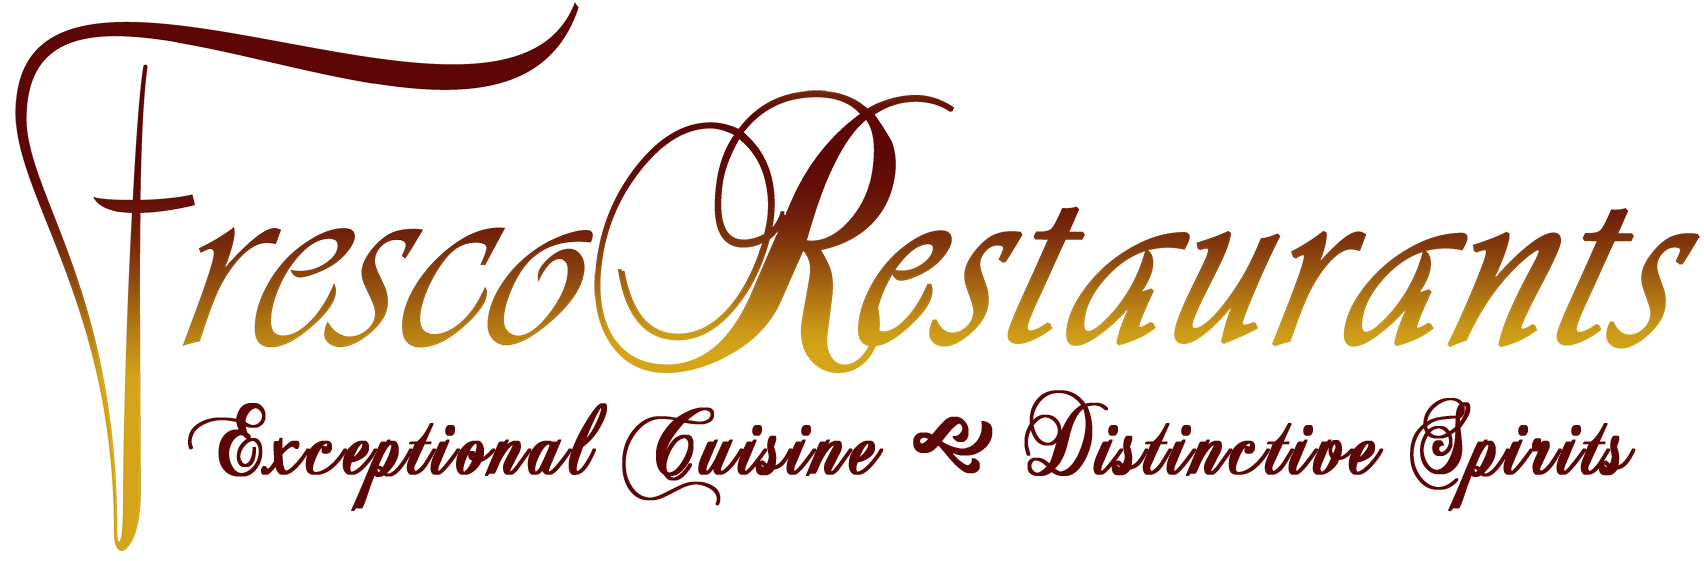 jrw-logo2015